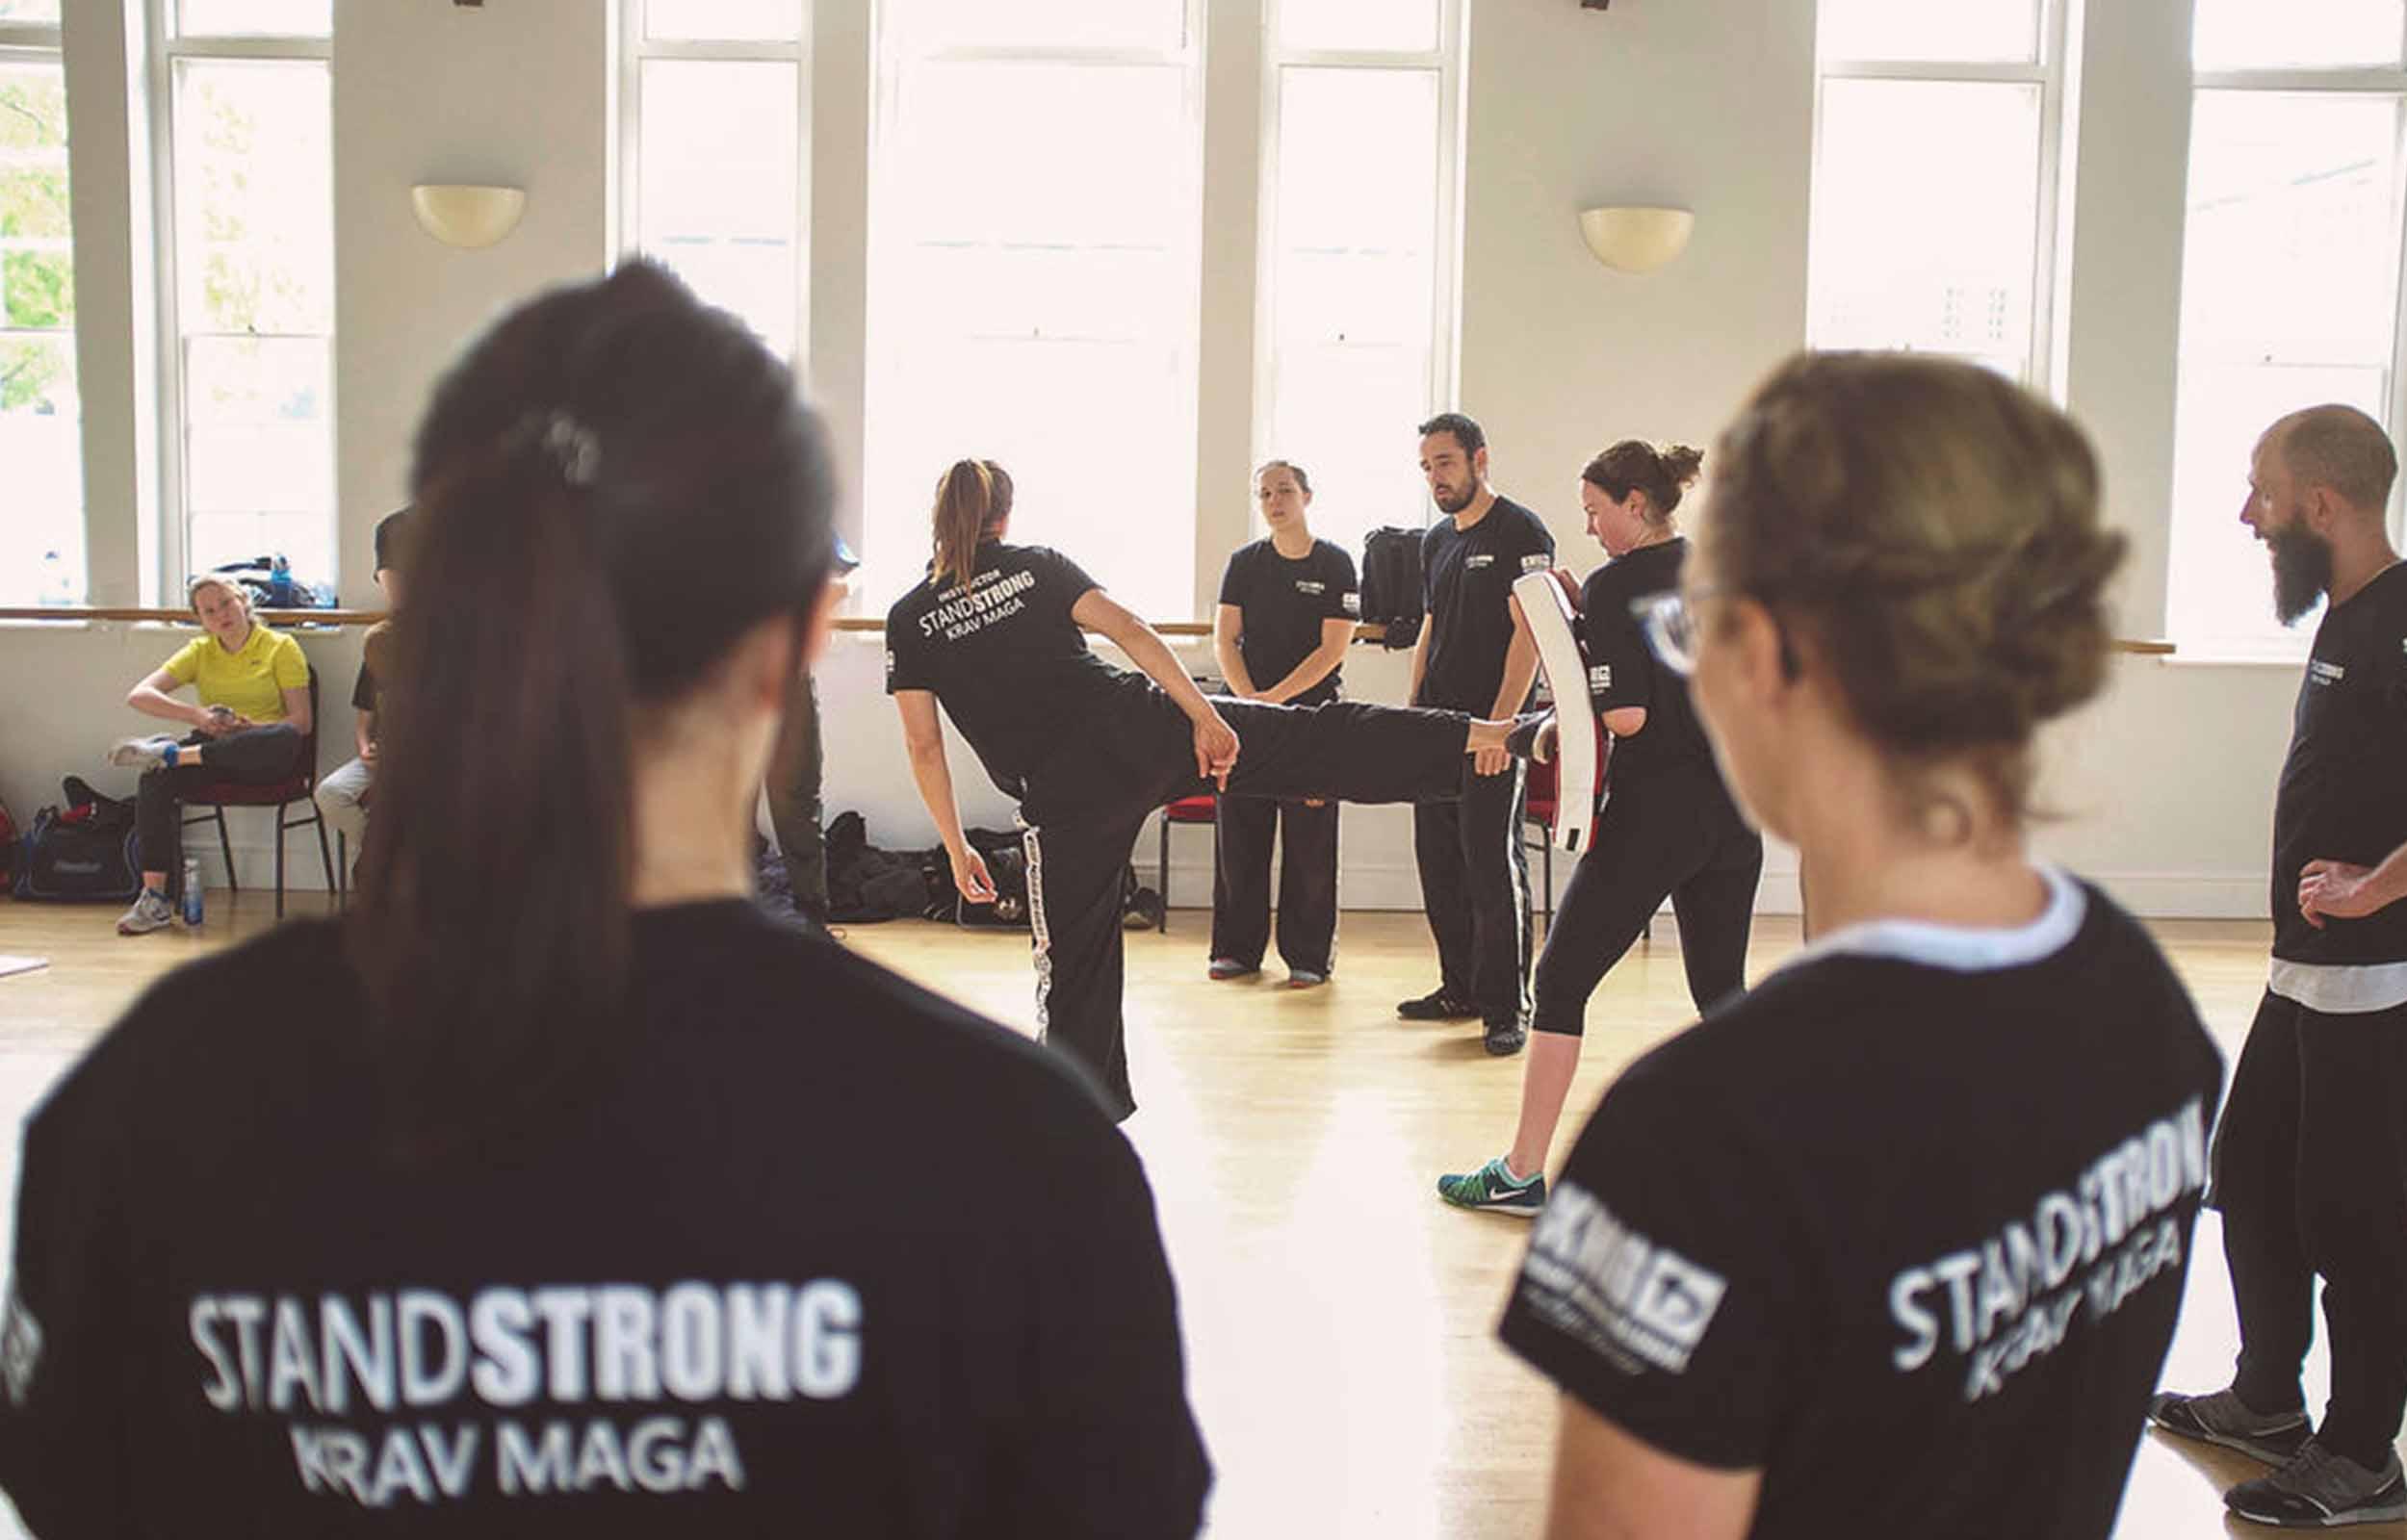 Krav Maga self-defence classes in Bristol